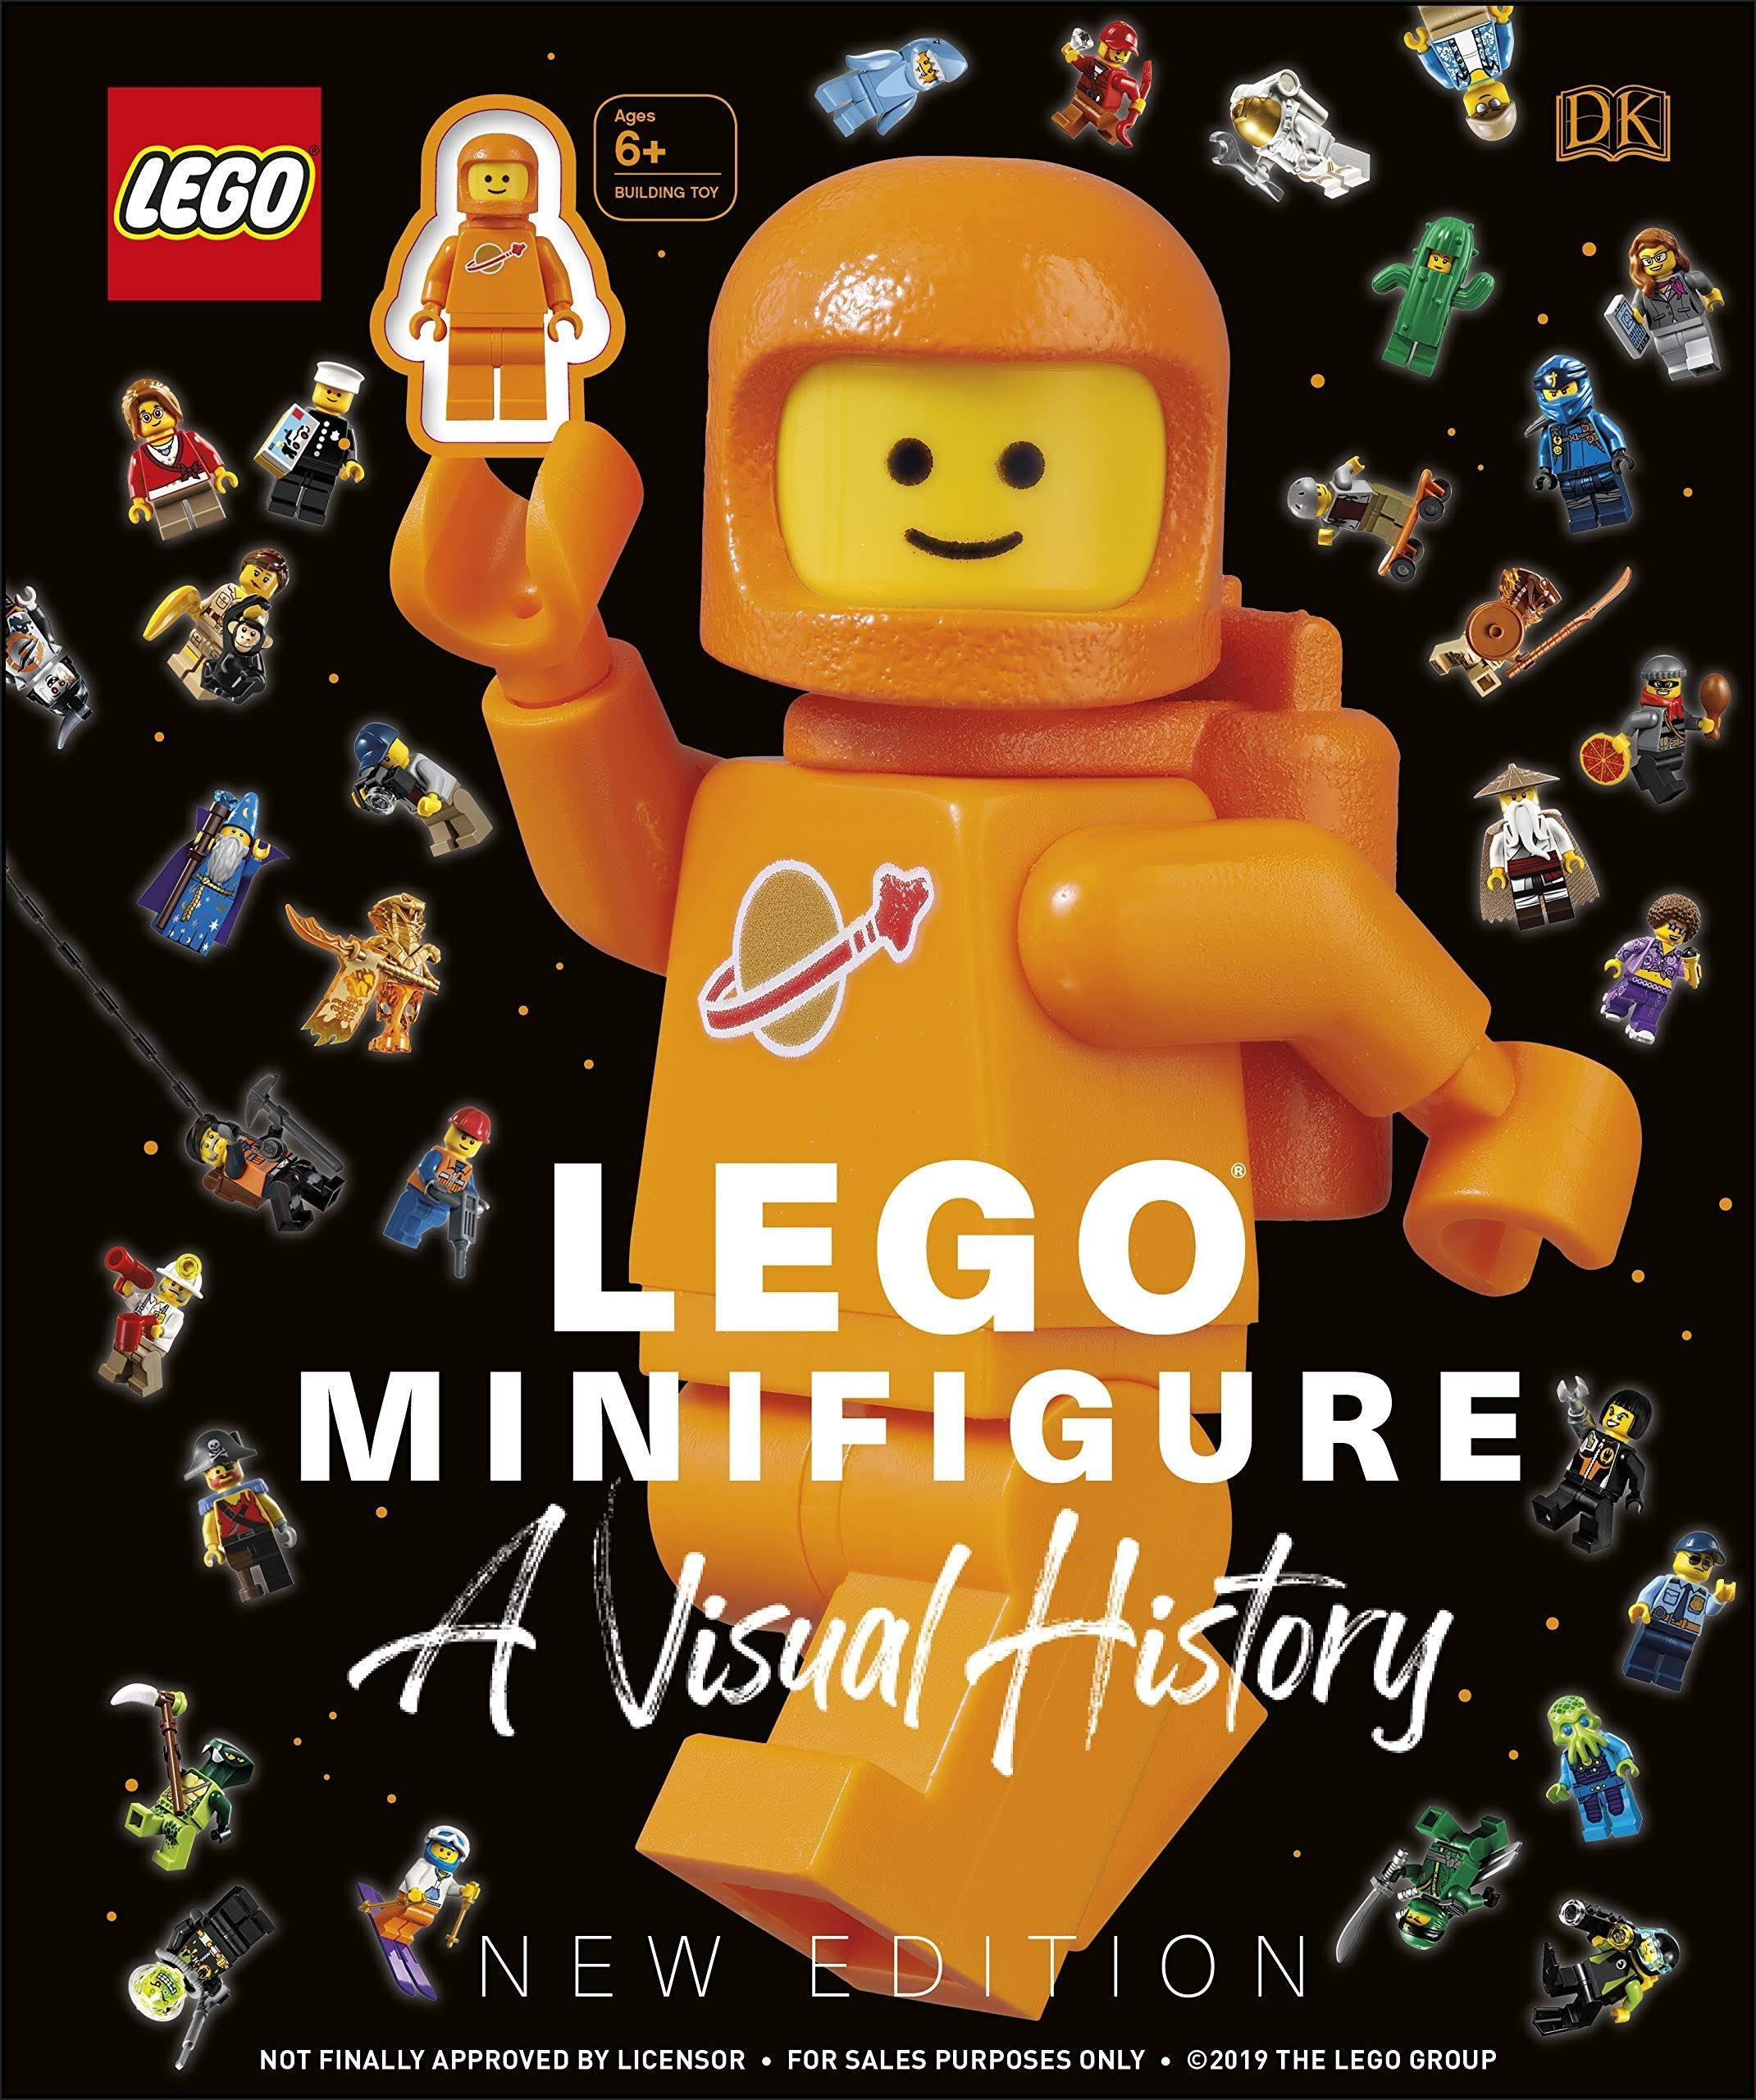 classic-space-lego-minifigur-orange-buch zusammengebaut.com